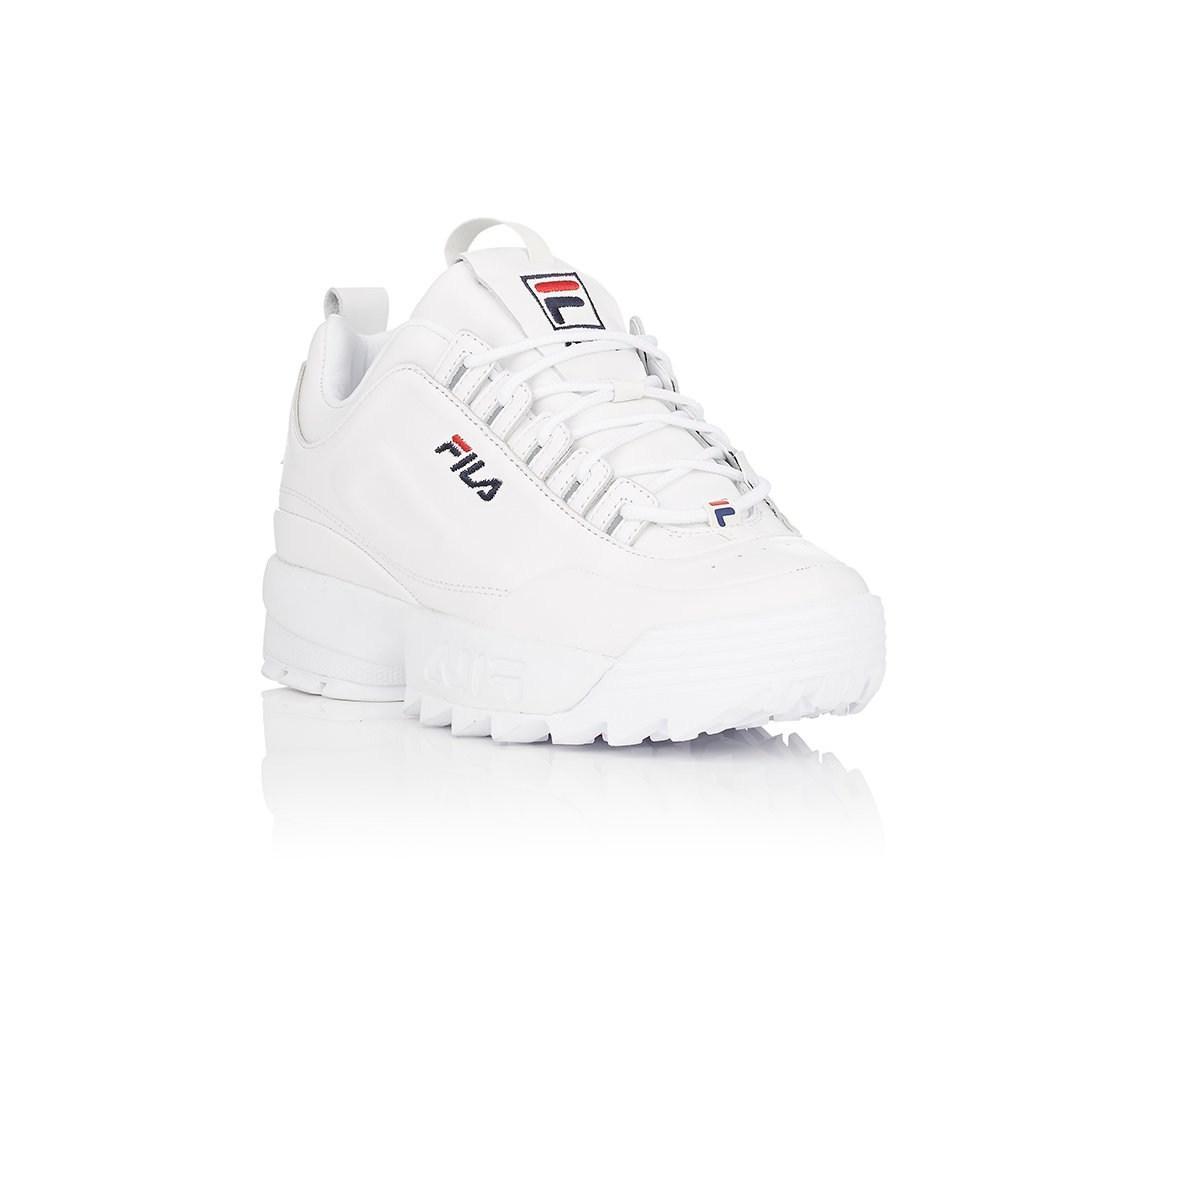 13dfac73c7a5 Fila - White Disruptor 2 Lux Leather Sneakers - Lyst. View fullscreen